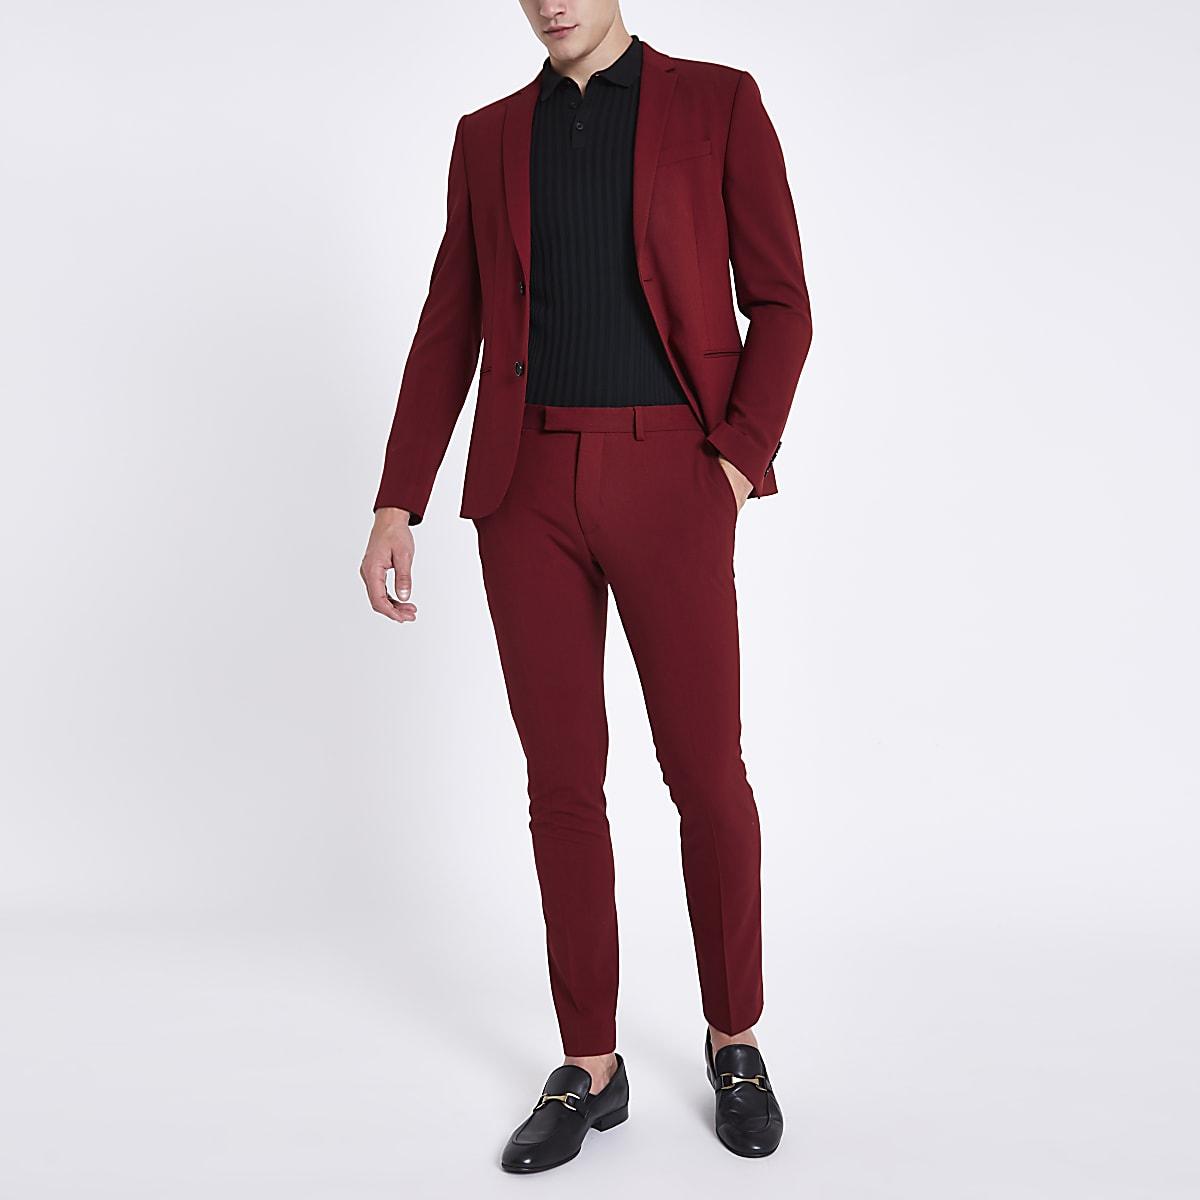 1e7f31b4acfad Pantalon de costume super skinny rouge Pantalon de costume super skinny  rouge ...